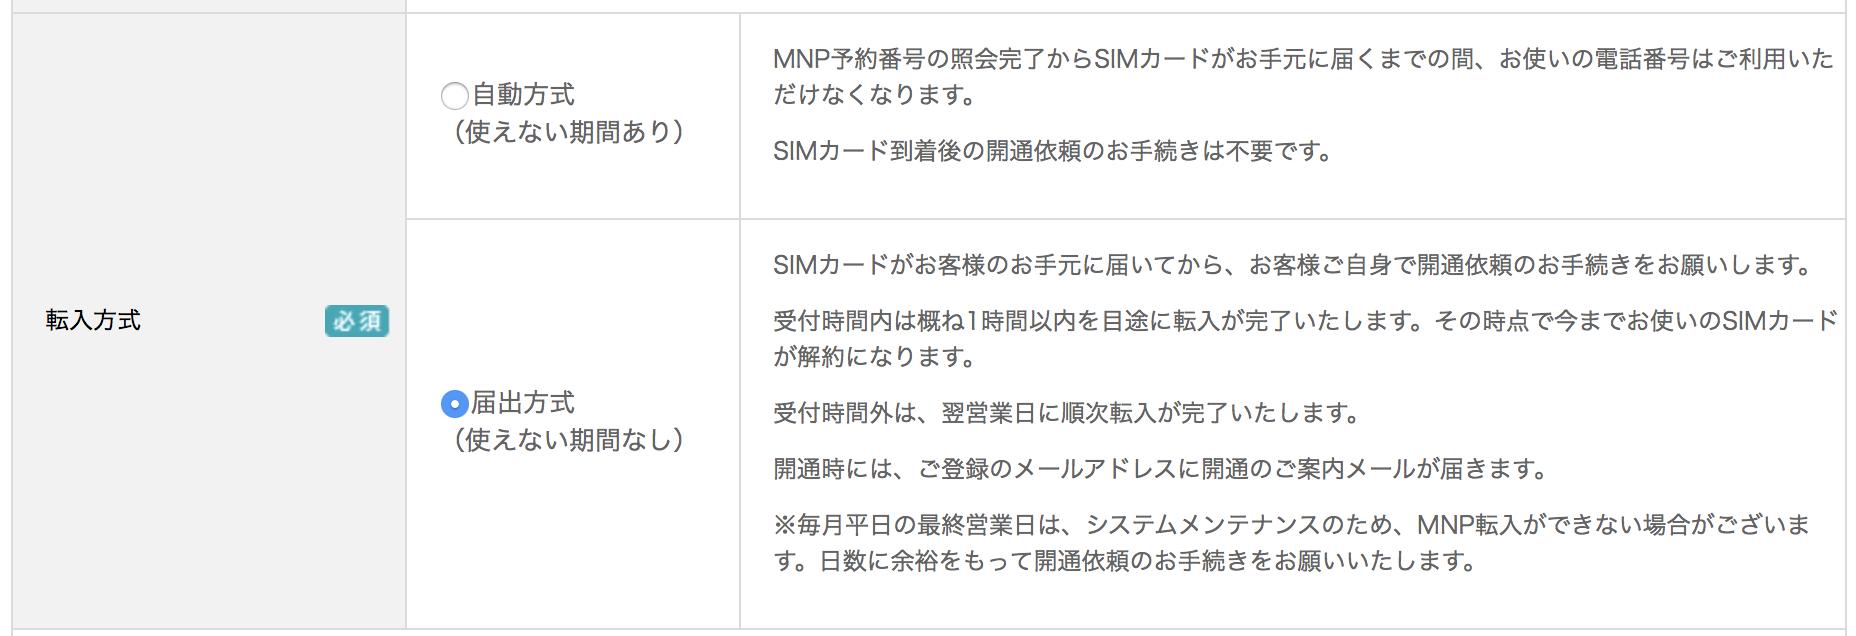 MNPでU-mobileに乗り換える場合の注意点